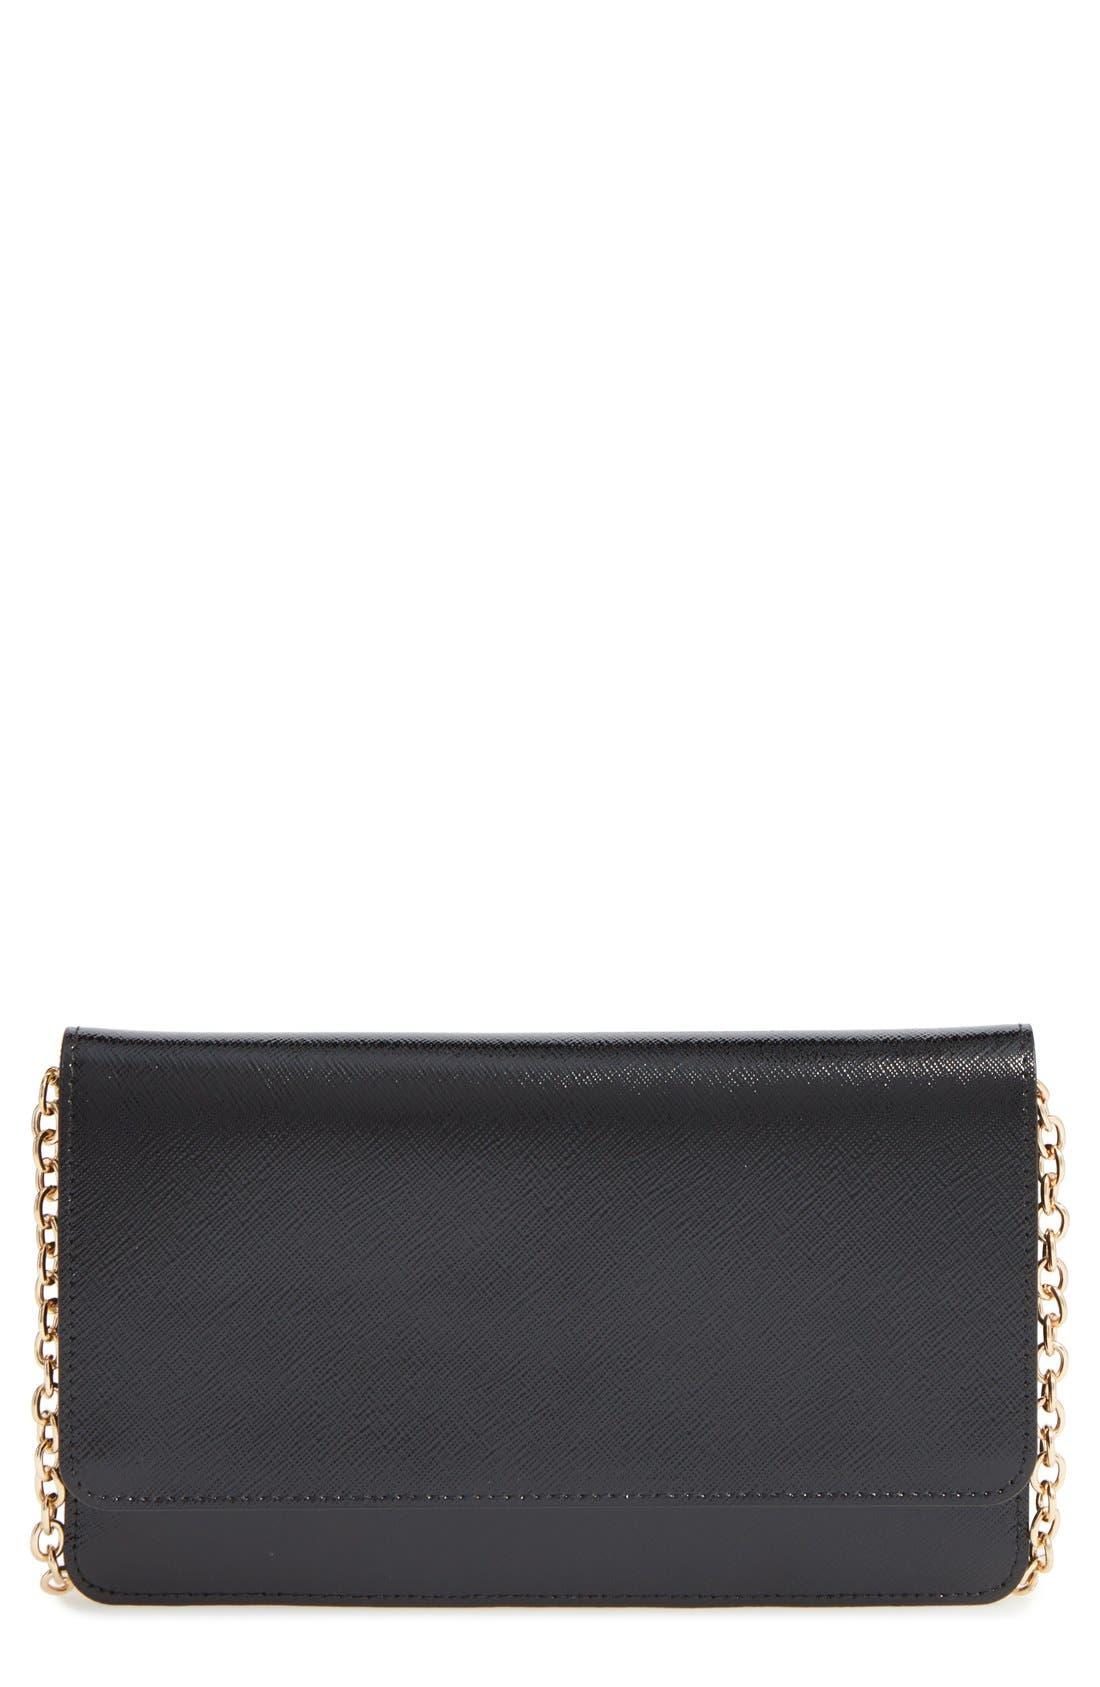 Main Image - Halogen® 'Eve' Leather Crossbody Bag